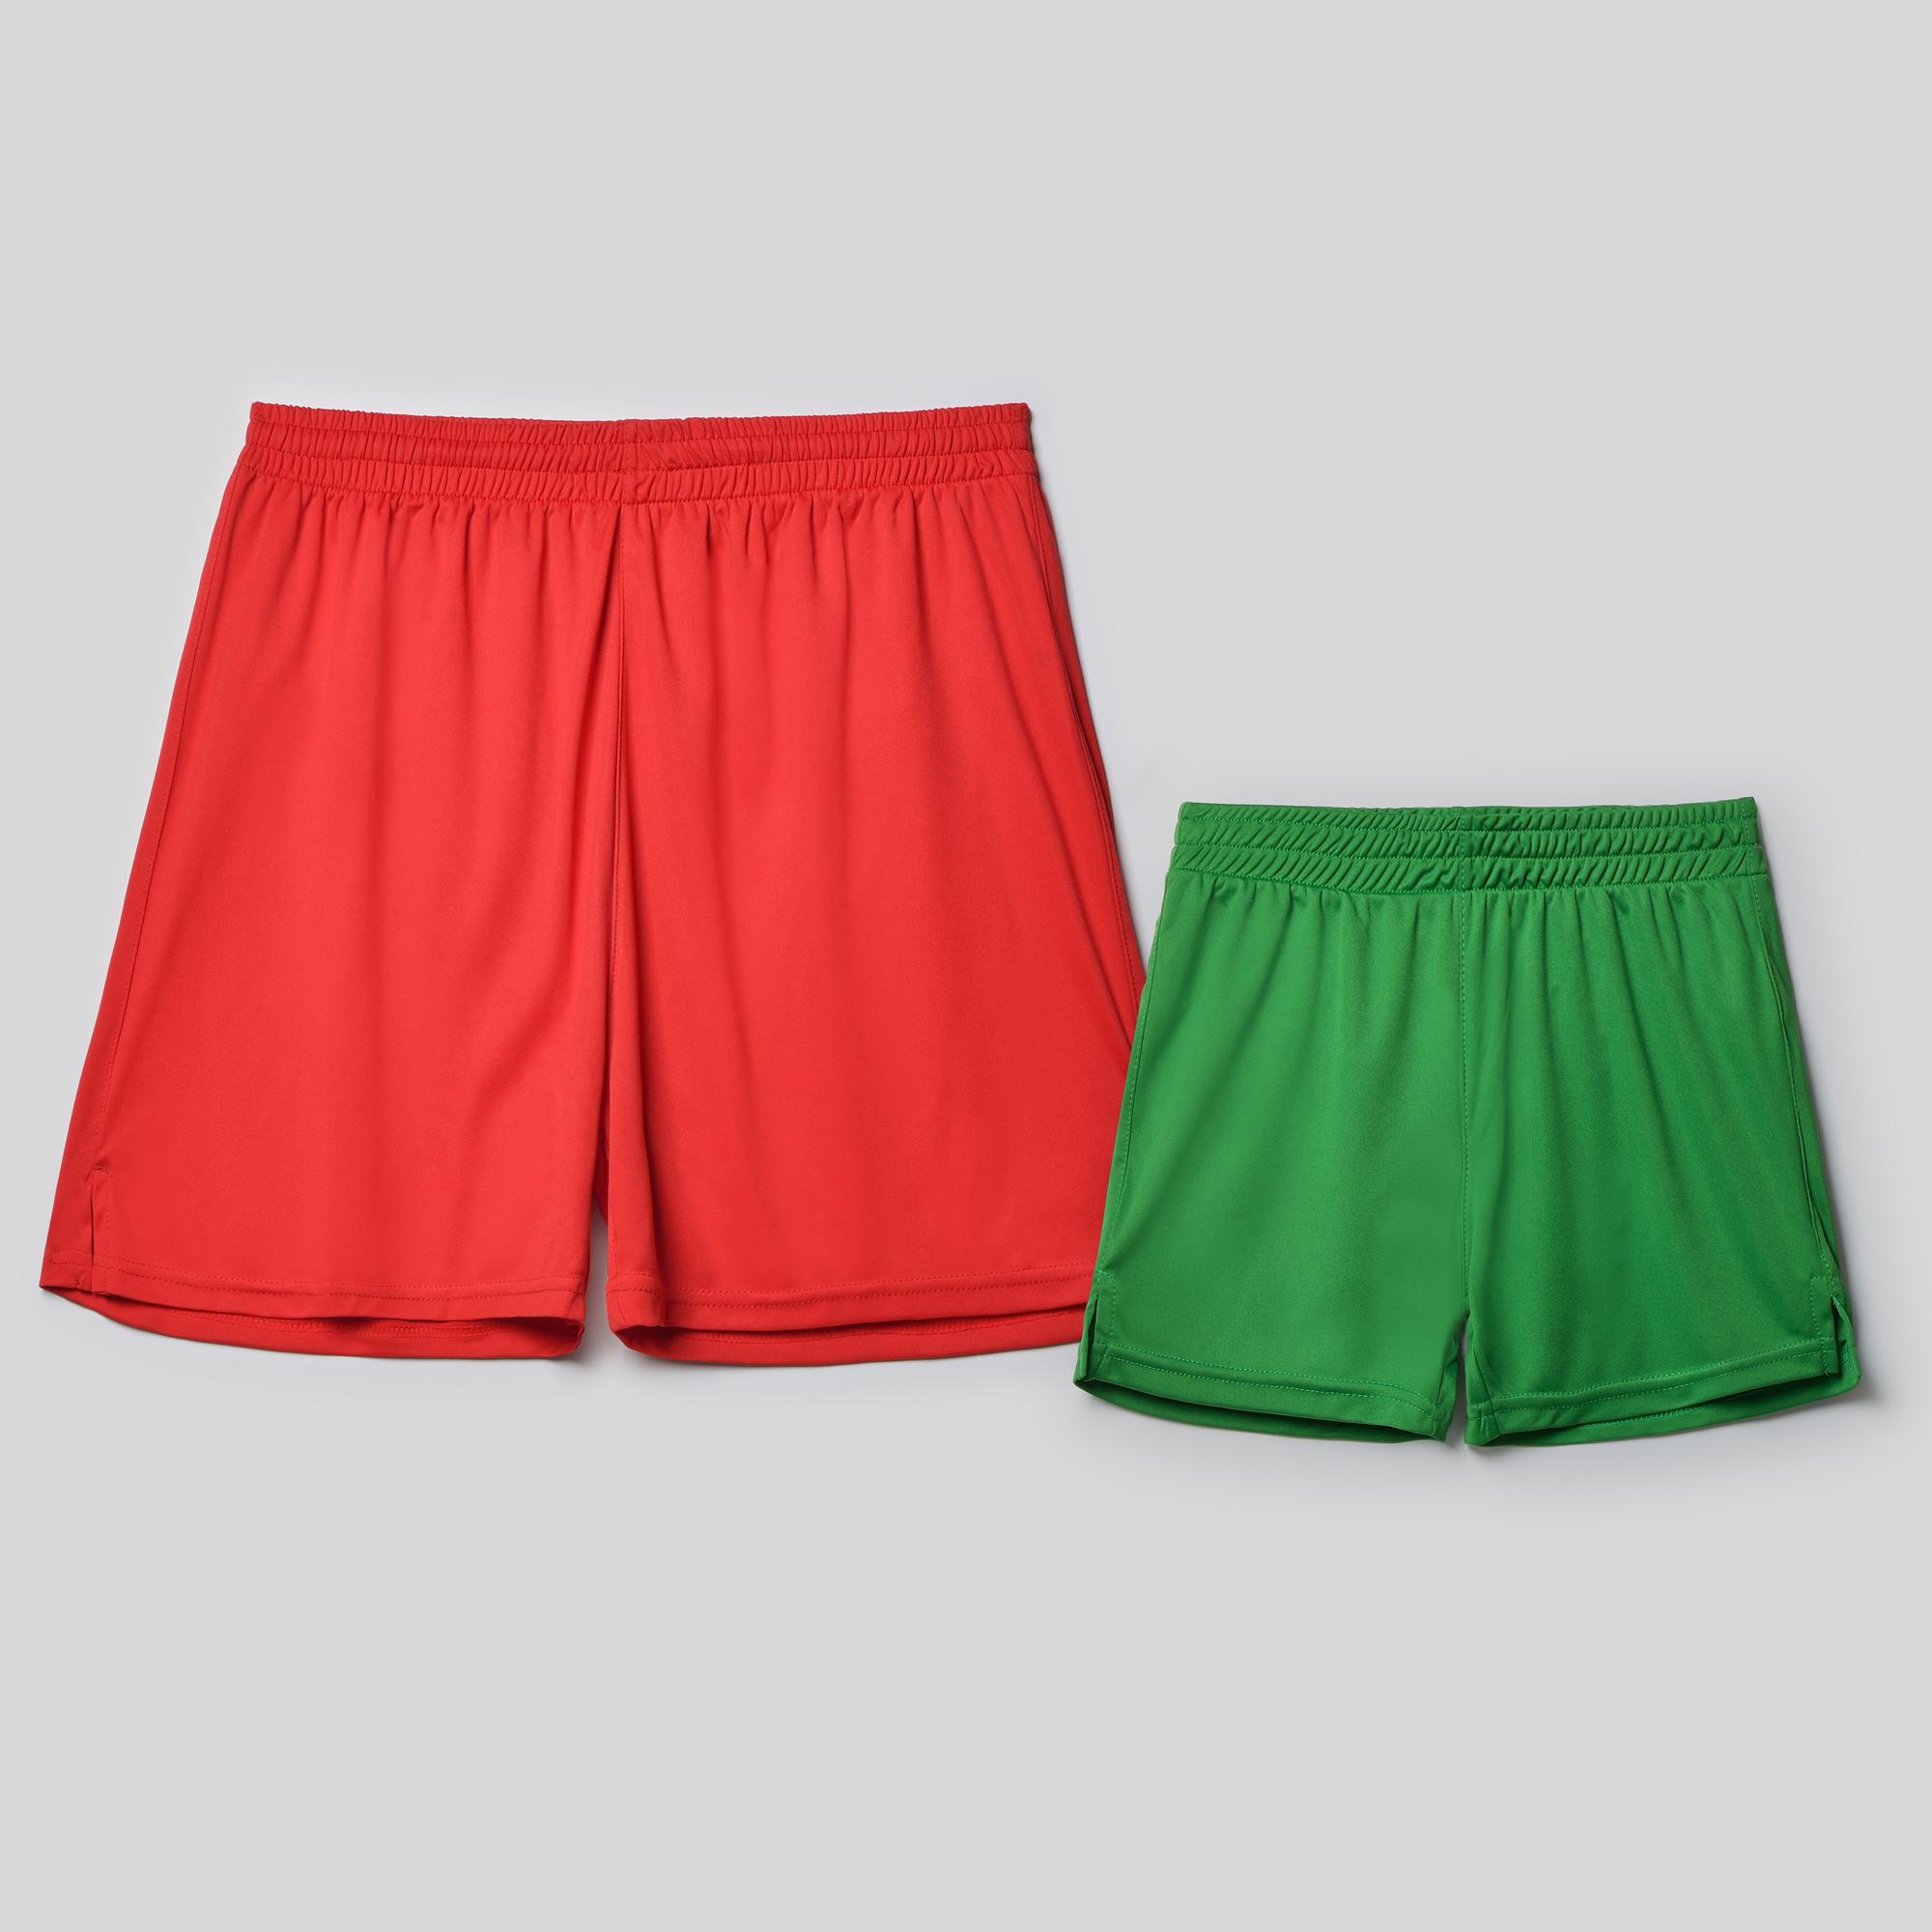 Pantalon corto ROLY calcio